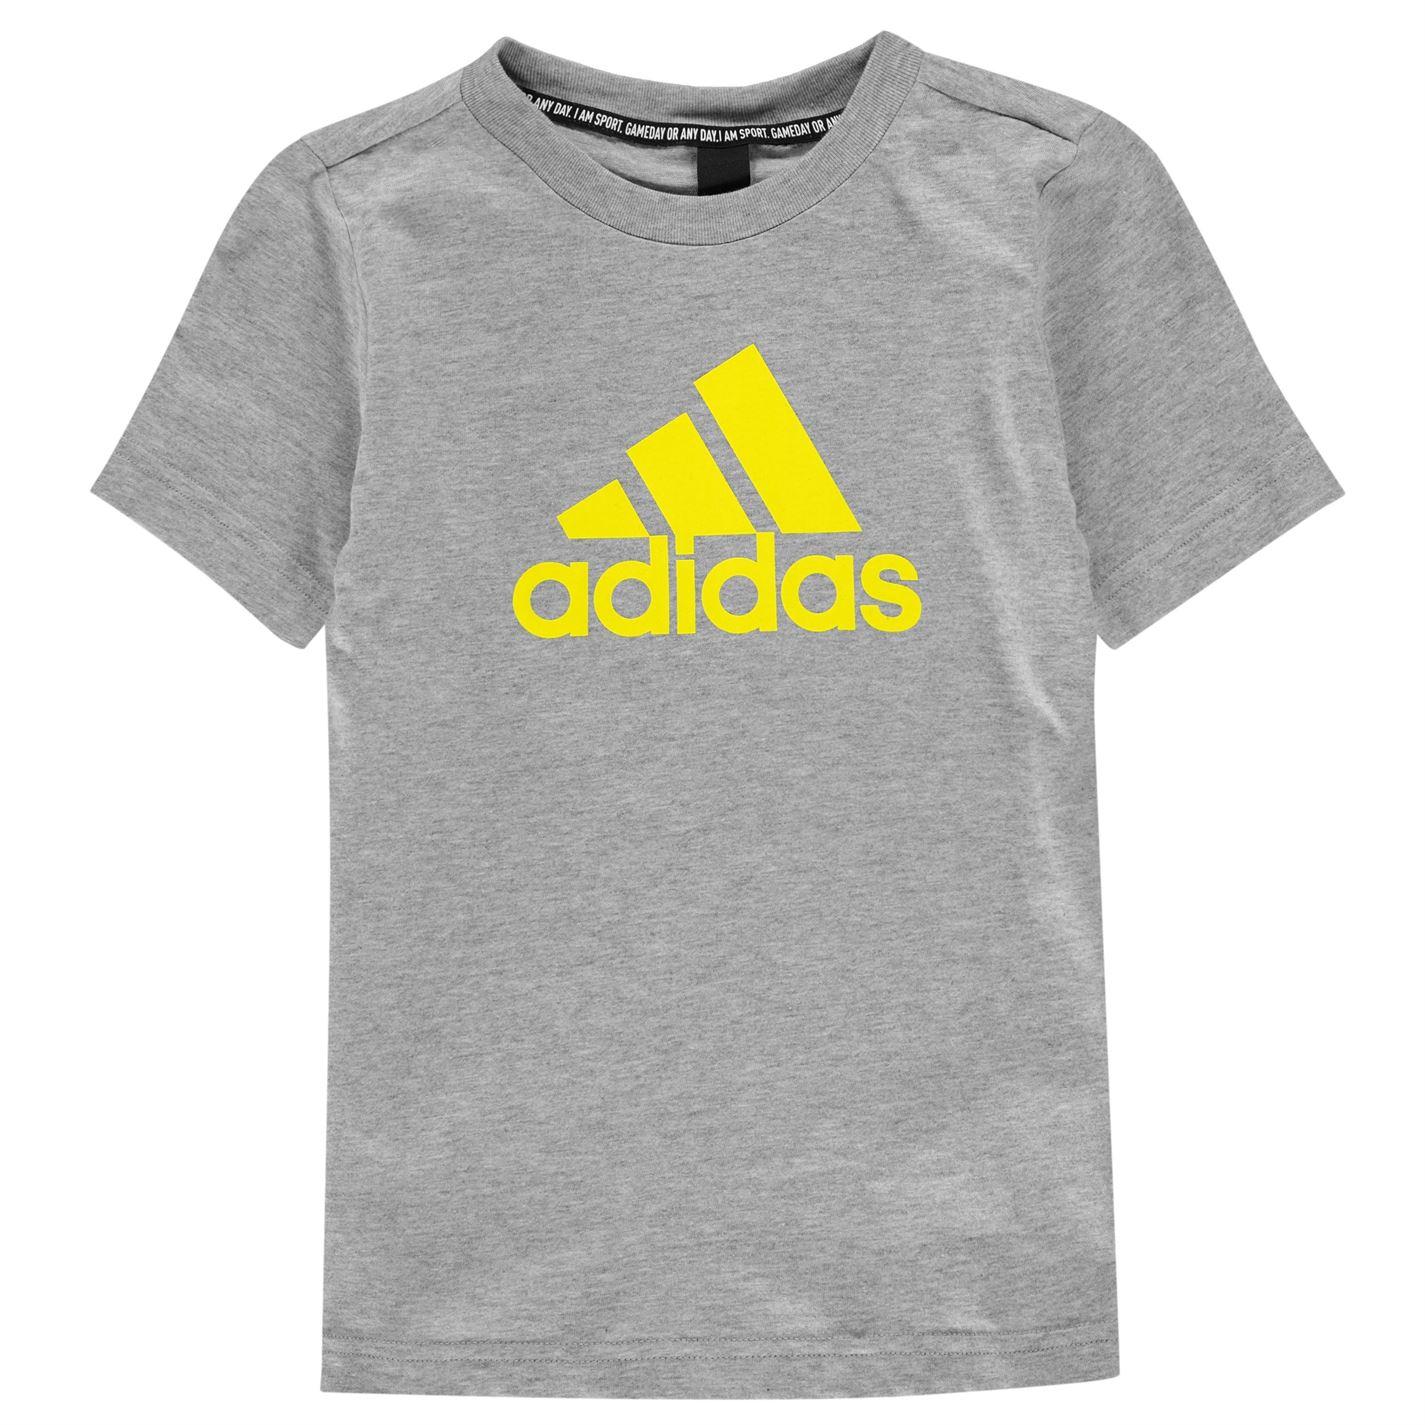 Adidas T Shirt Junior Boys